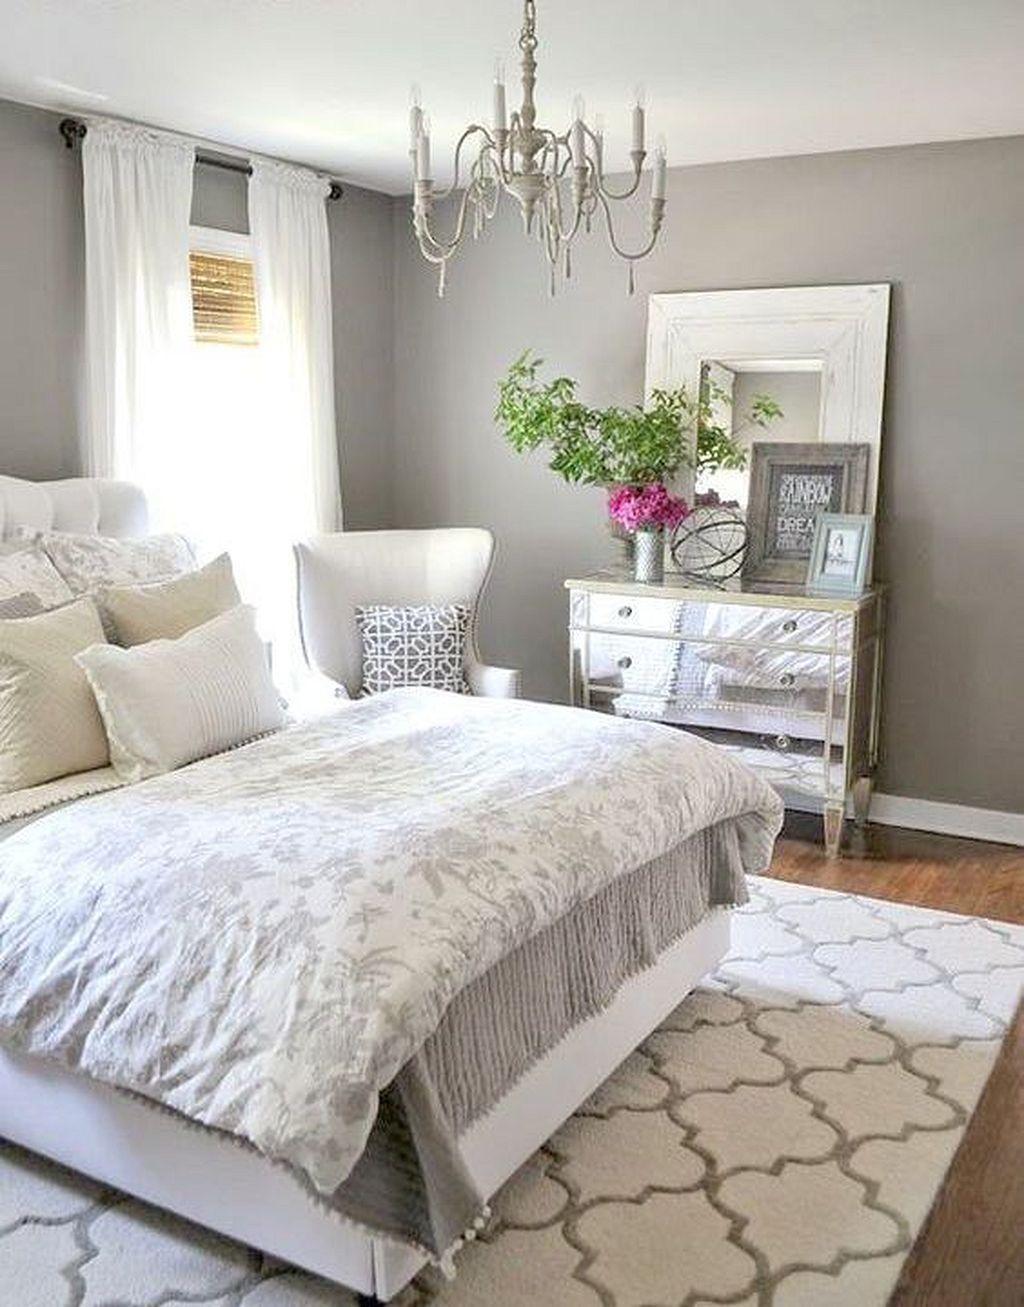 Master bedroom furniture ideas  Incredible Master Bedroom Decorating Ideas  Master bedroom